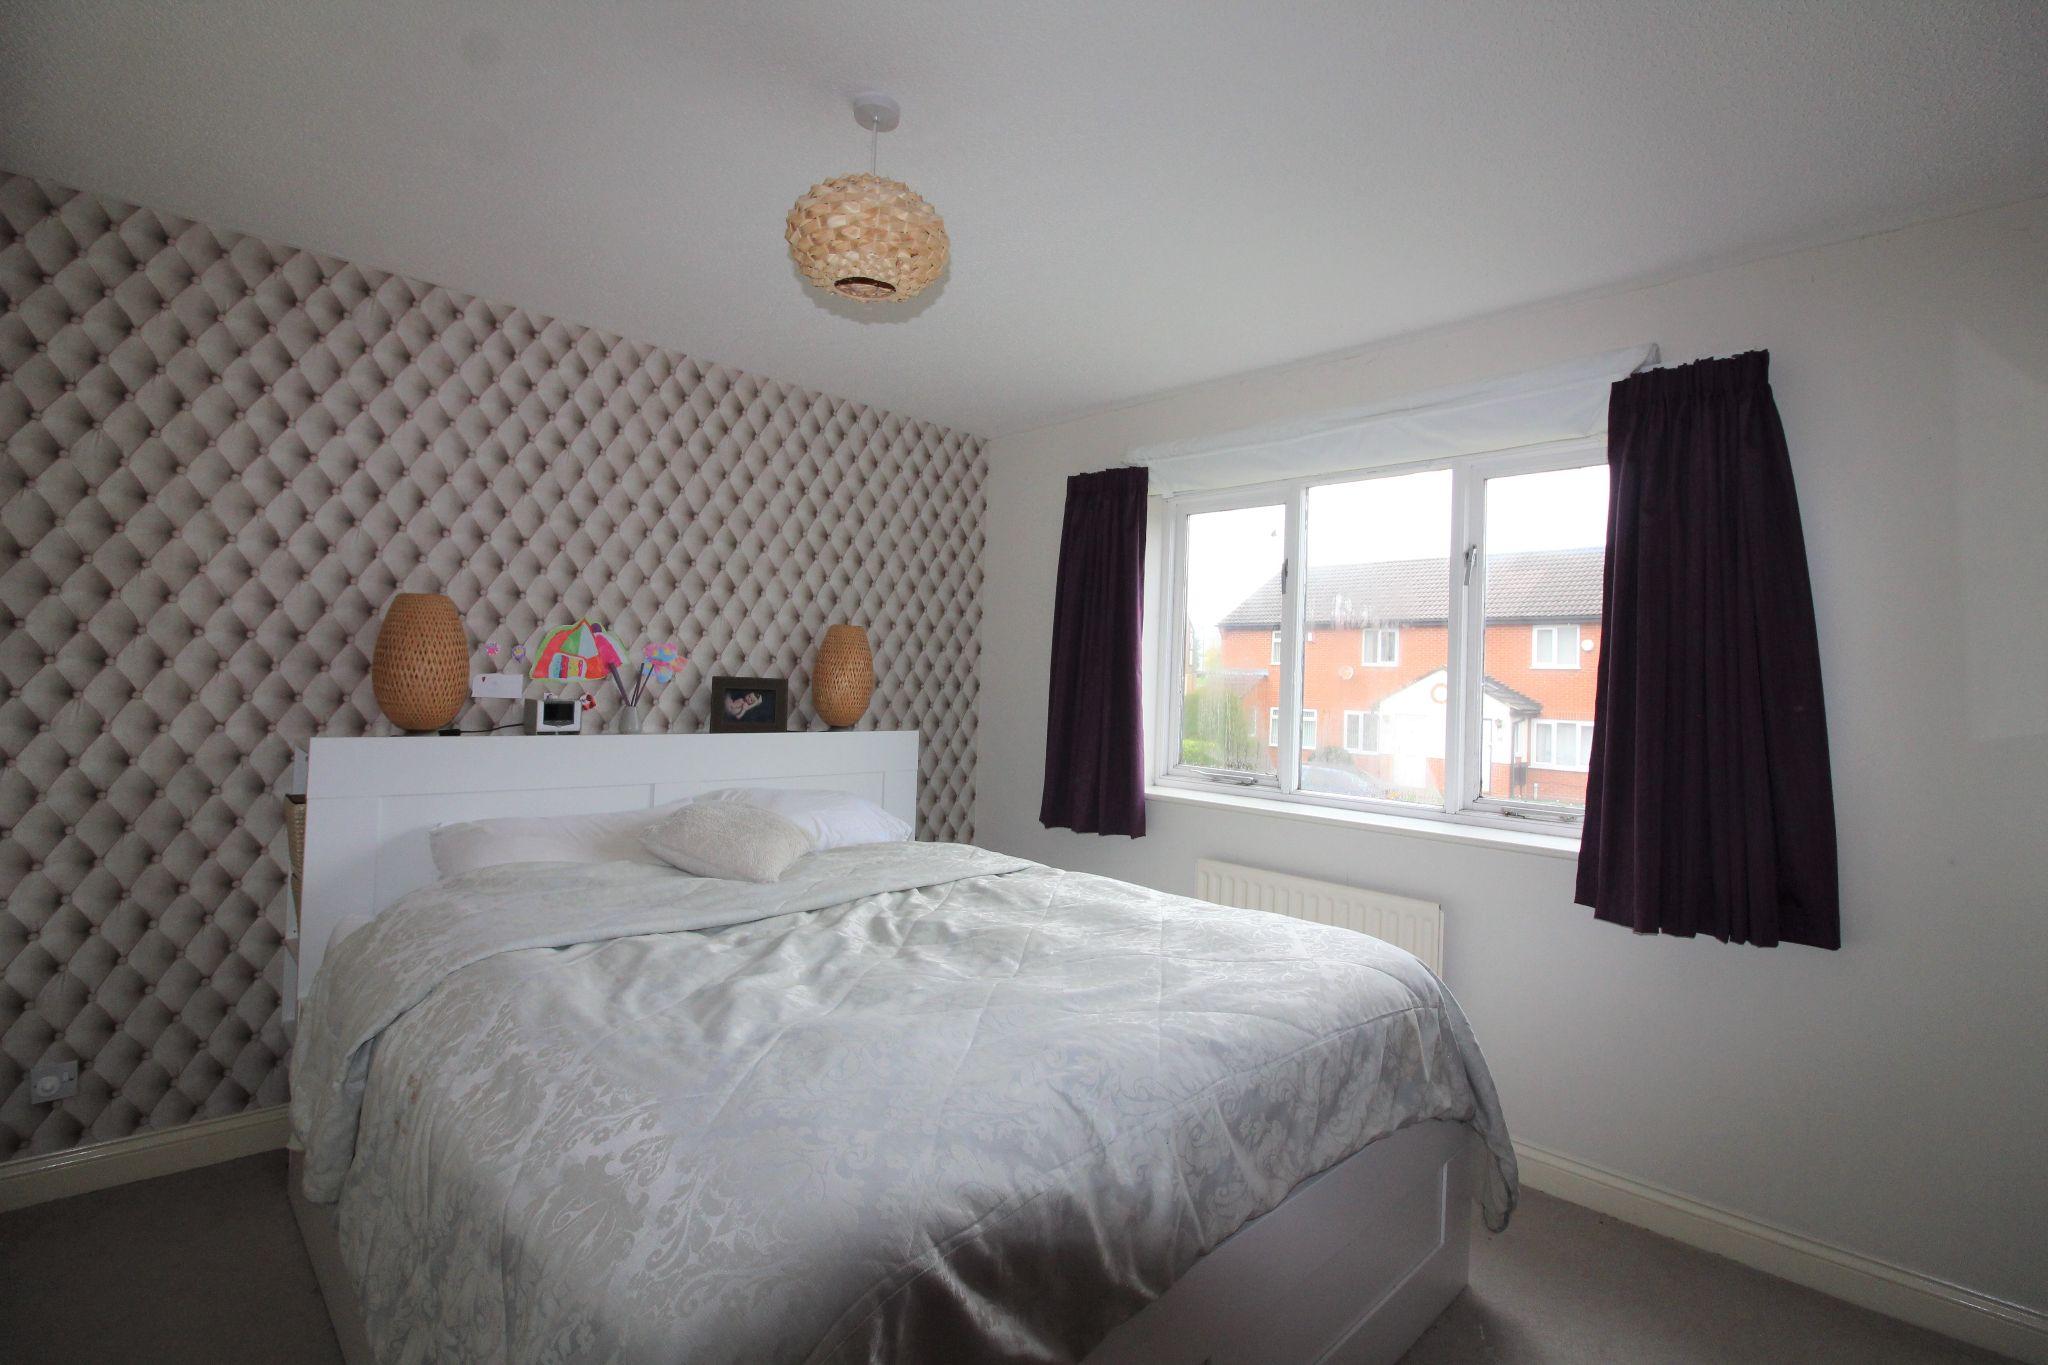 4 bedroom detached house Sale Agreed in Durham - Main Bedroom.